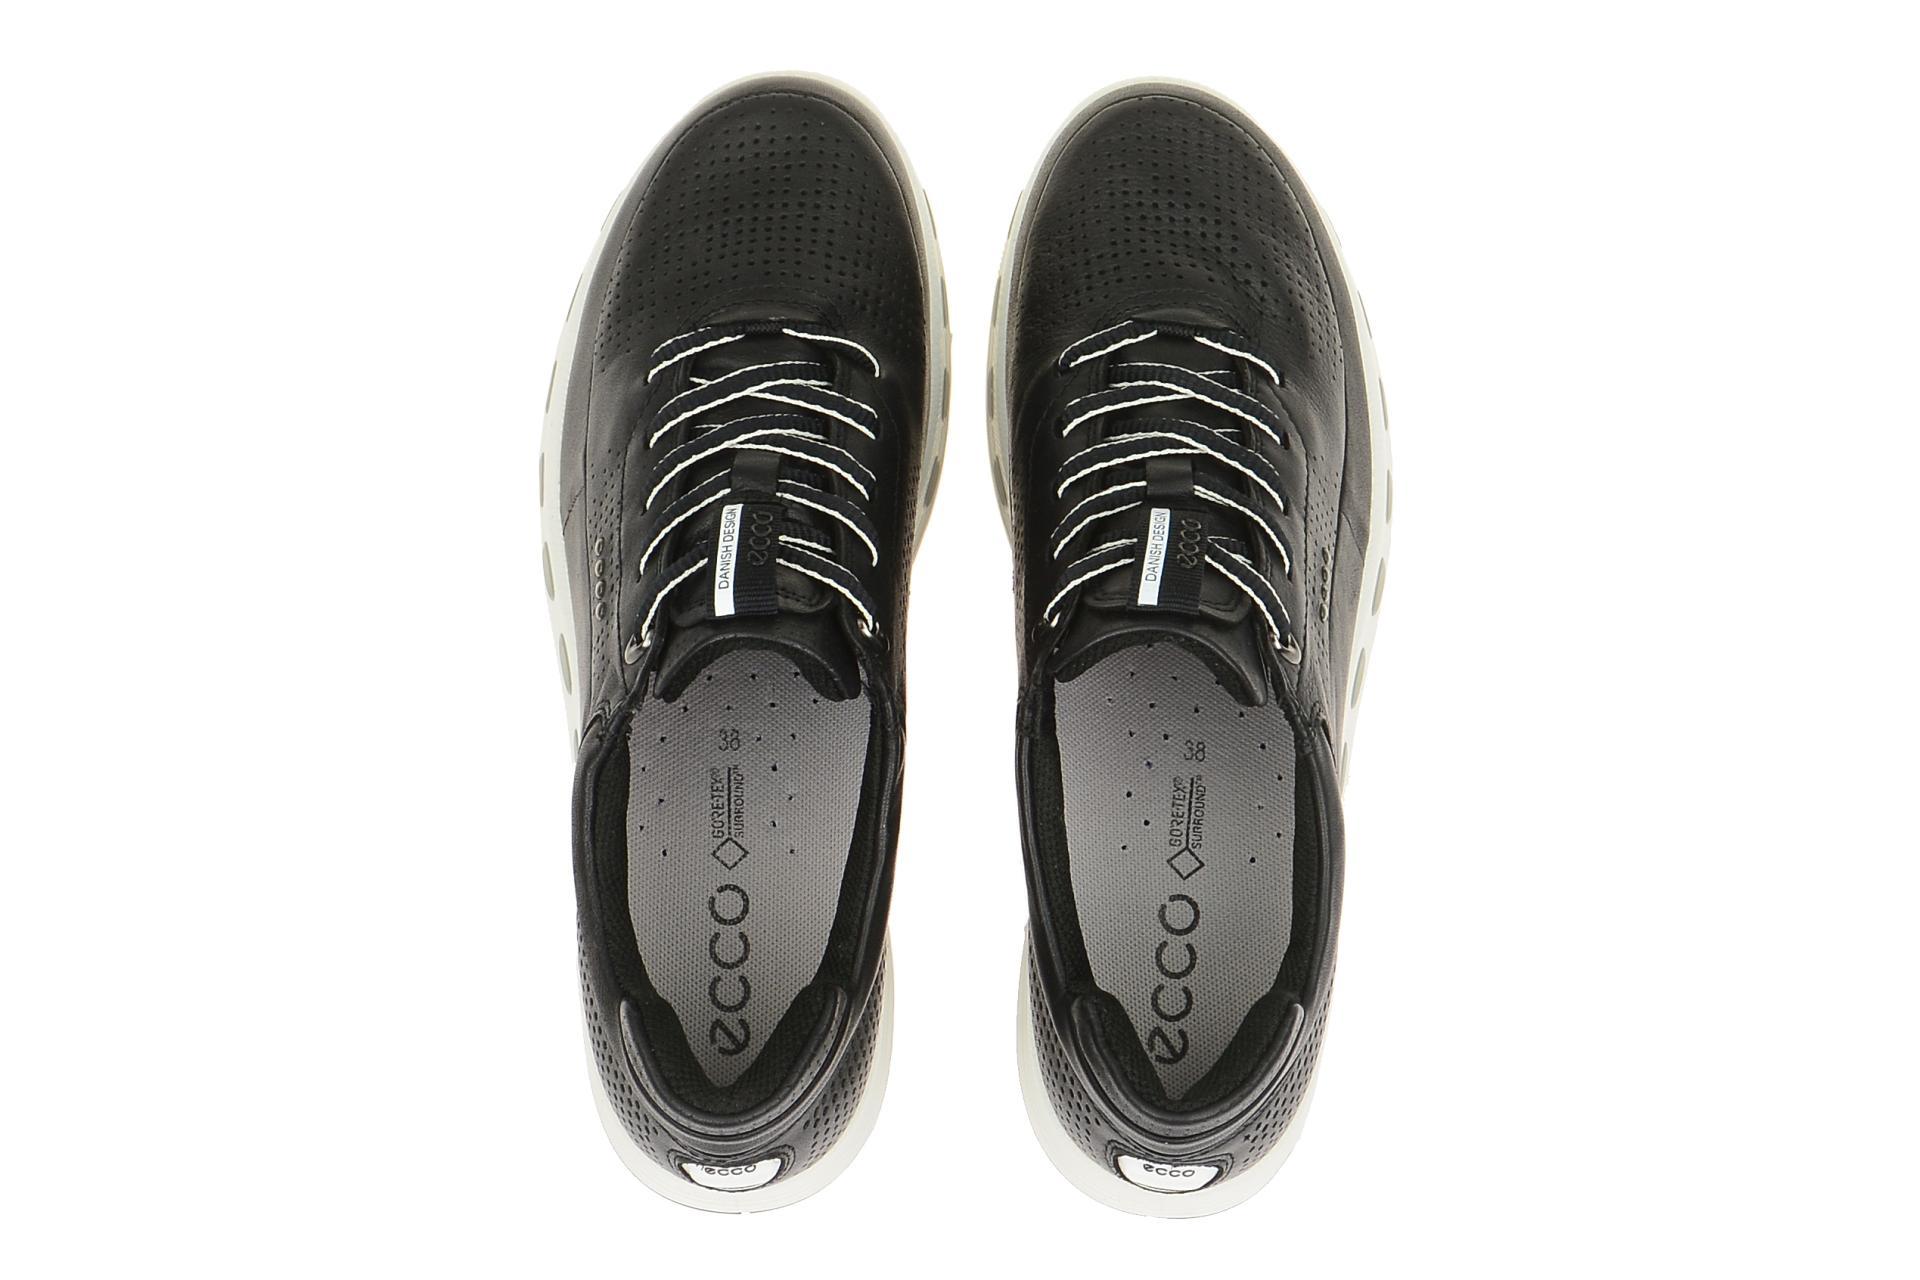 3f2e902593b51b Ecco Schuhe COOL 2.0 schwarz Damenschuhe Sportschuhe 84251301001 NEU ...